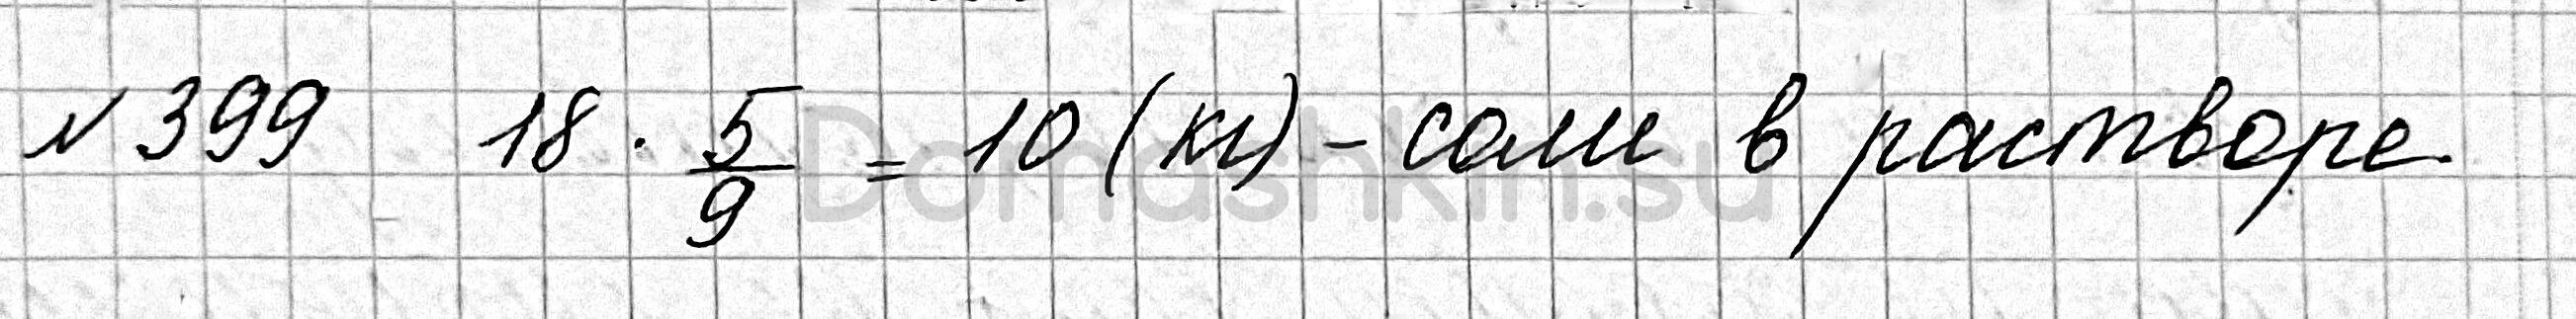 Математика 6 класс учебник Мерзляк номер 399 решение